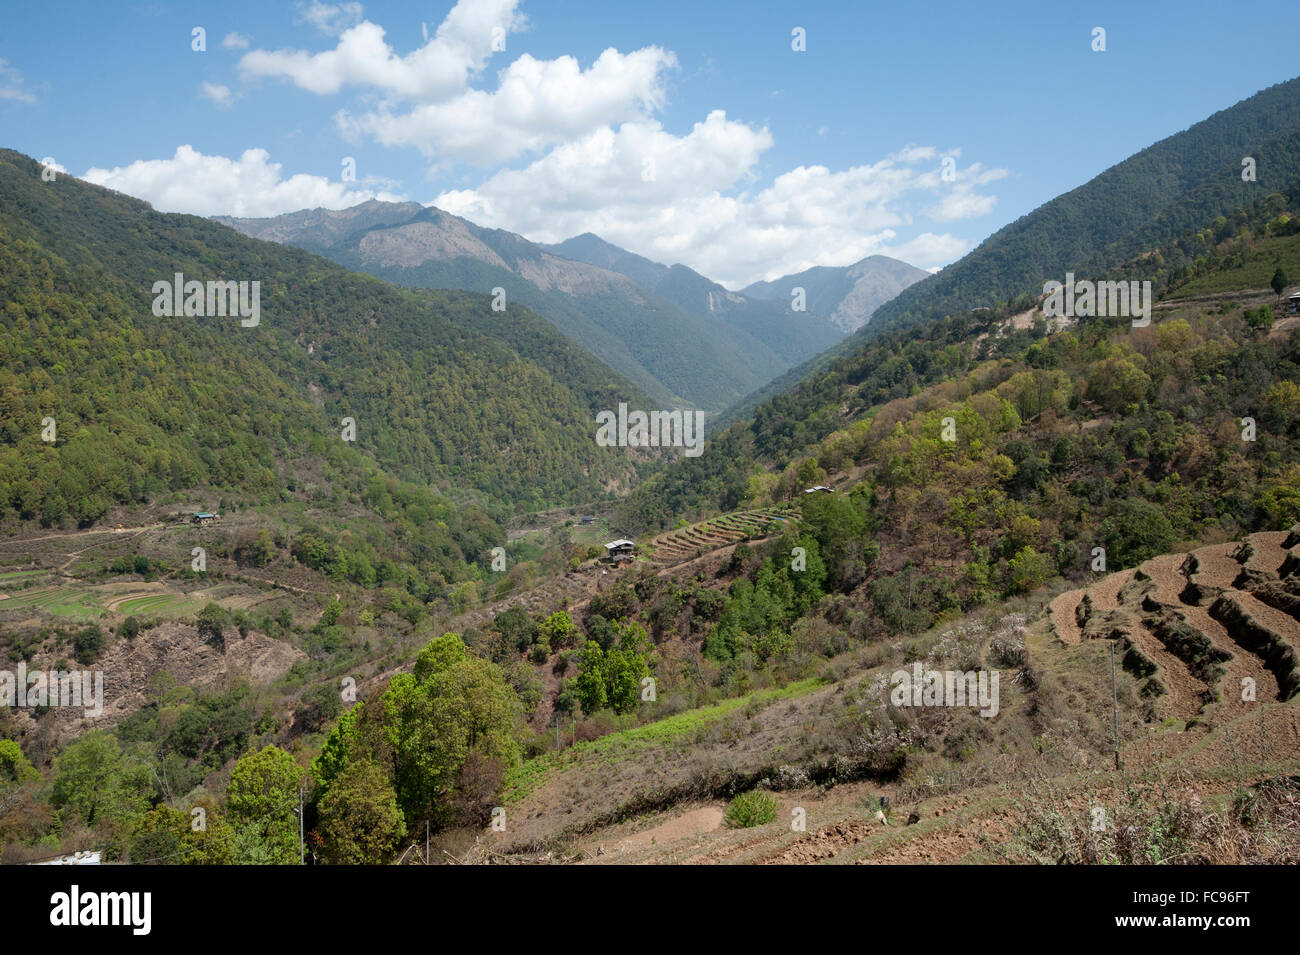 View through farmland clinging to the Himalayan foothills towards China from Wangdue Phodrang district, Bhutan, - Stock Image